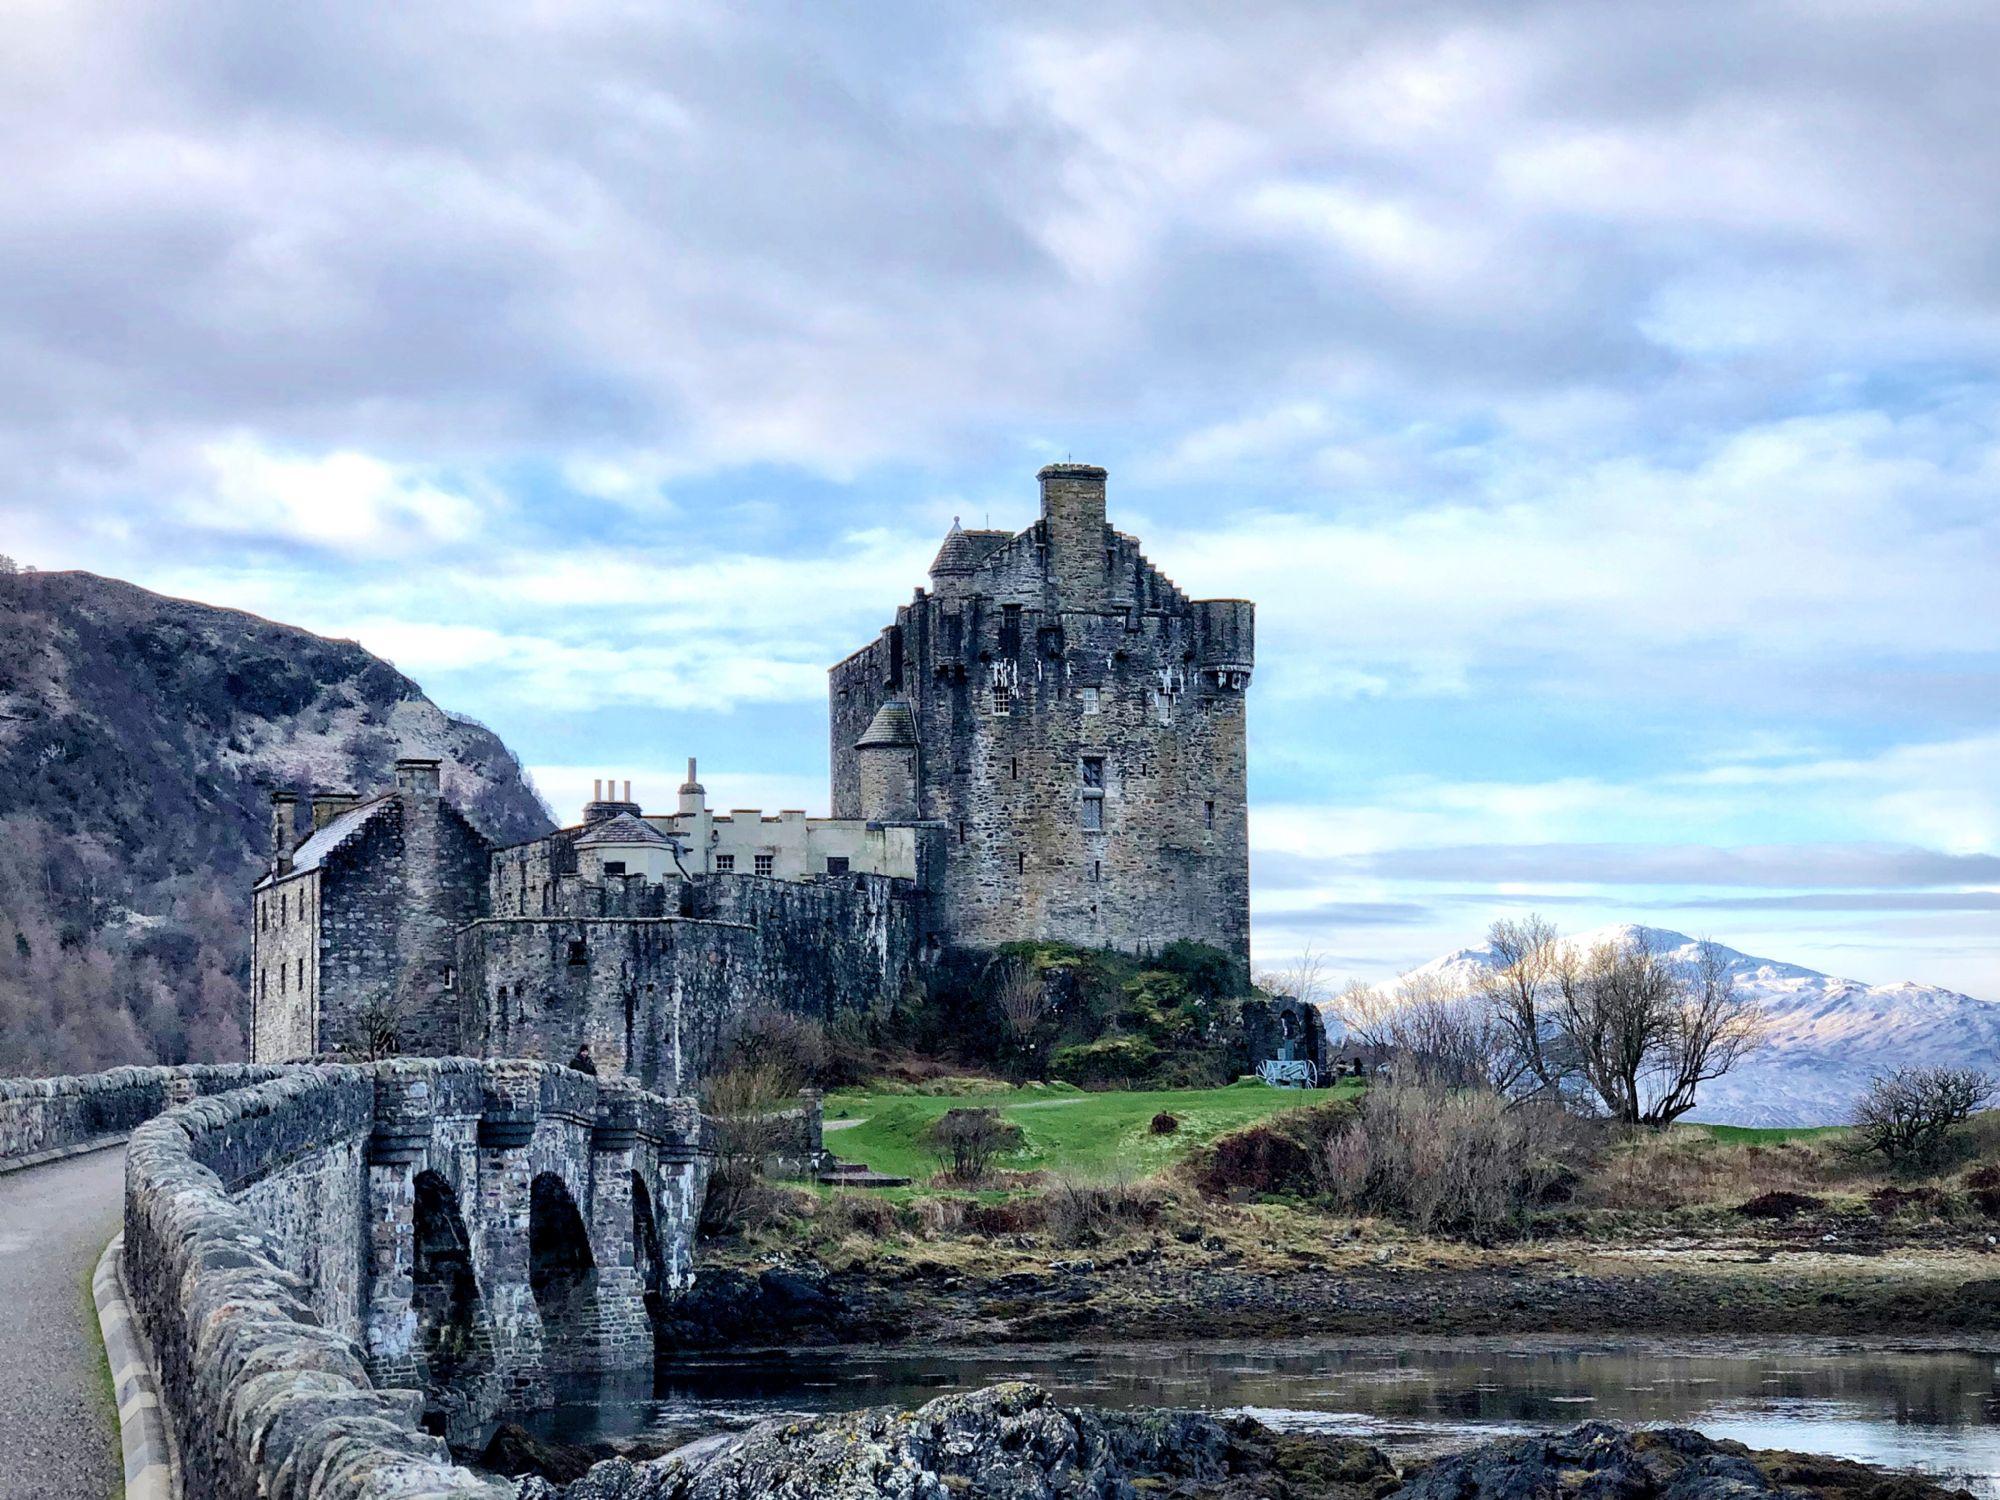 Eilean Castle. IG:mchbrahm